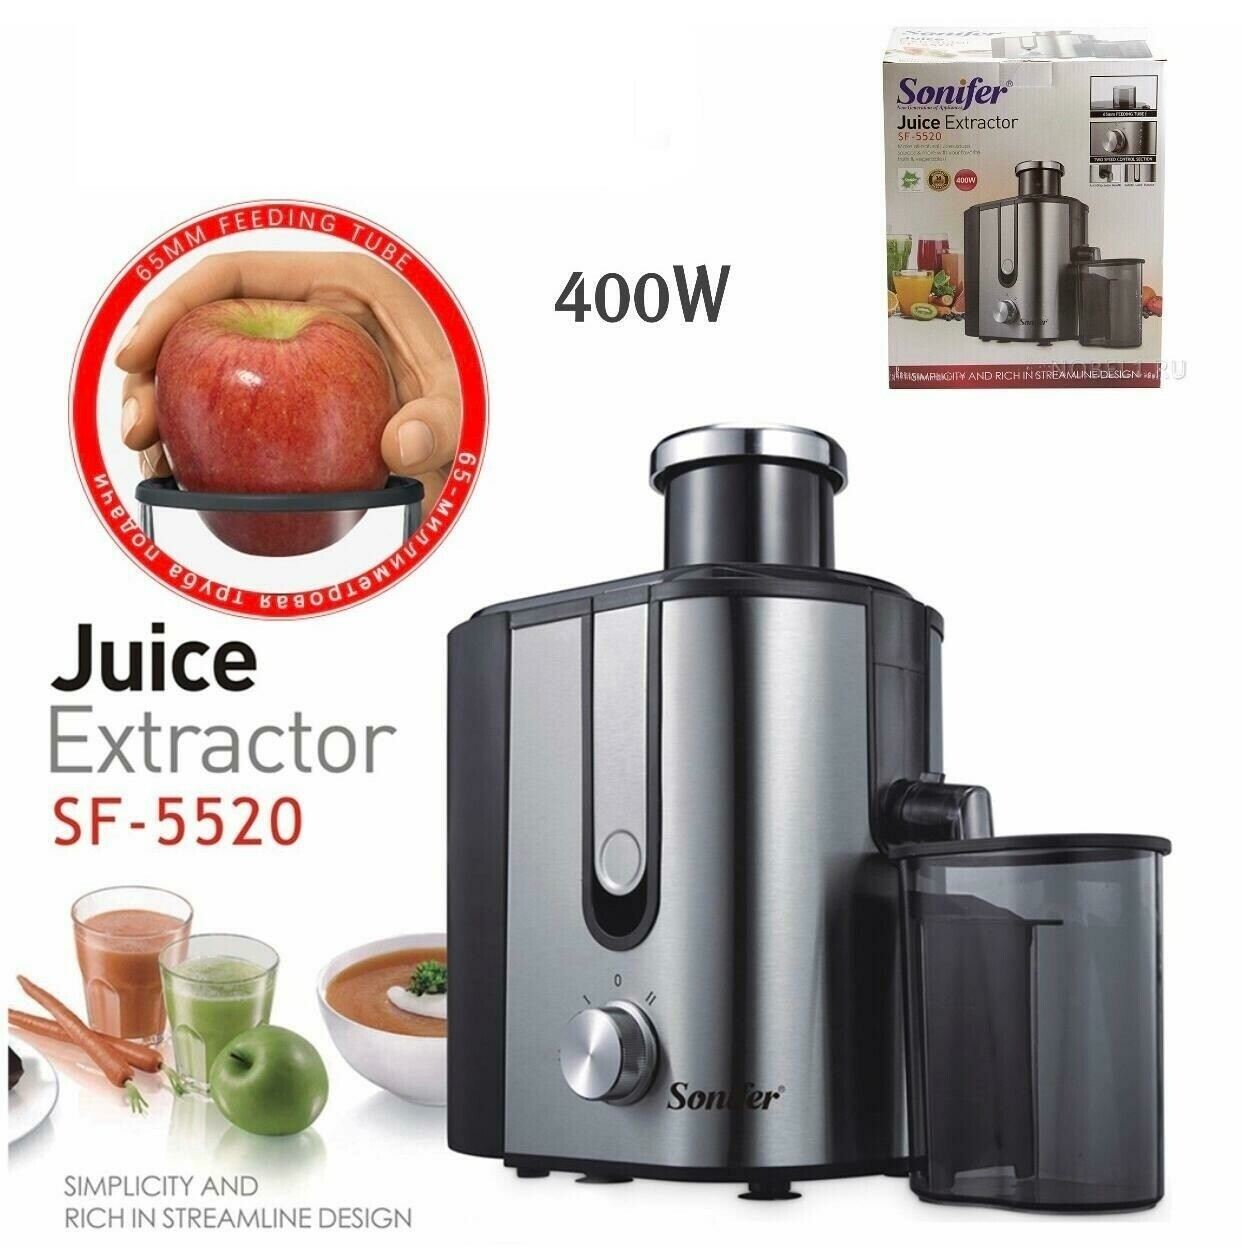 SONIFER Juice Extractor SF-5520